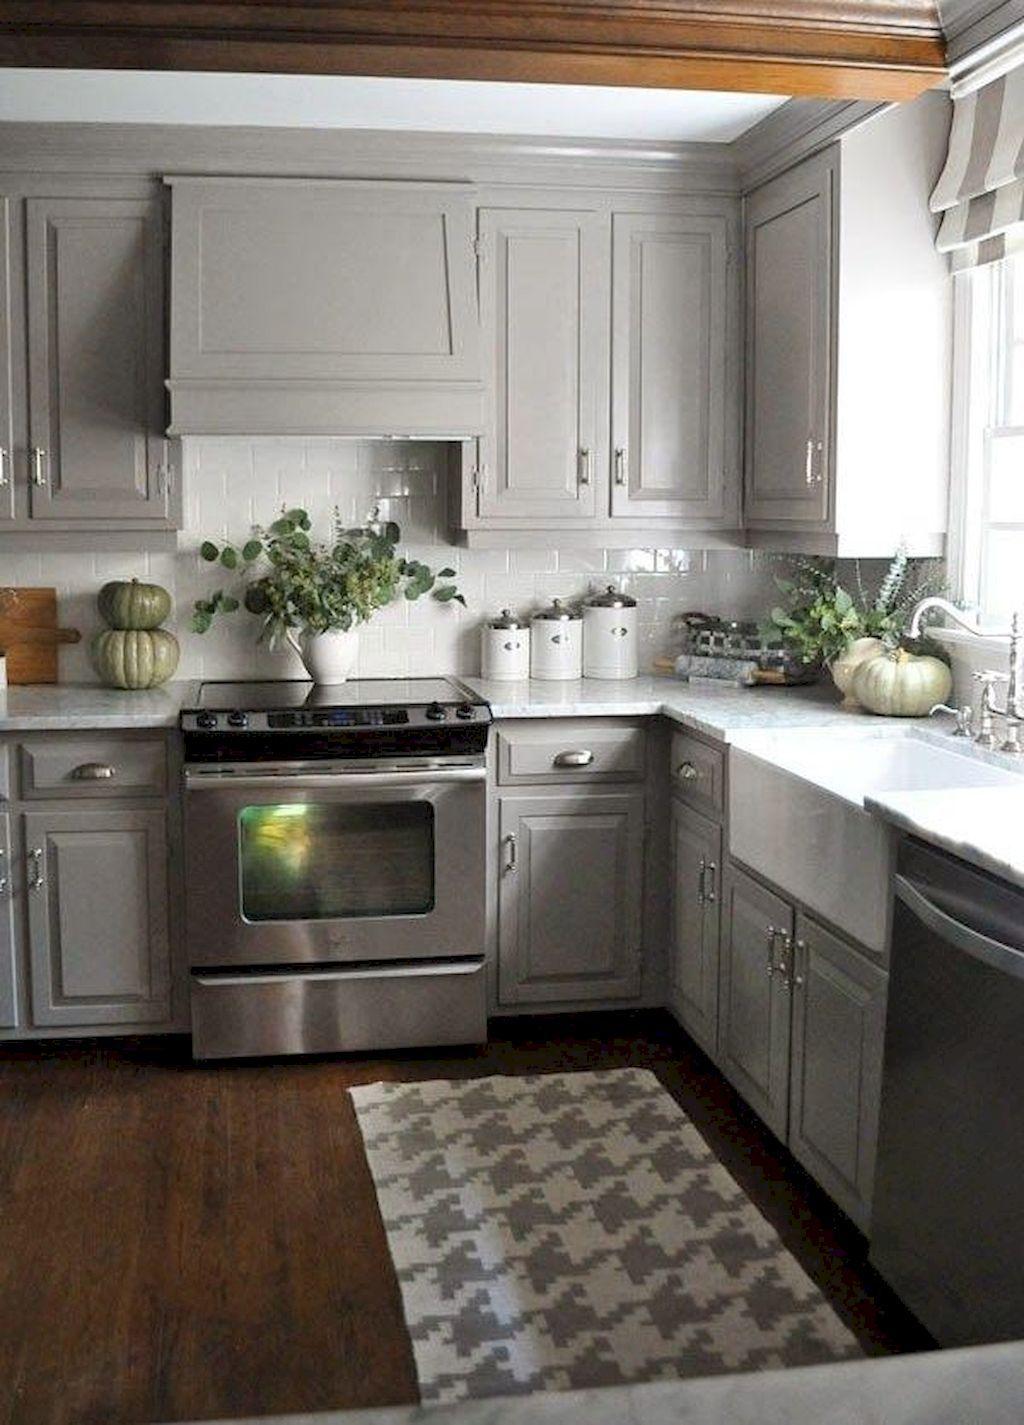 Pin by mariann solkey on kitchen ideas in pinterest grey